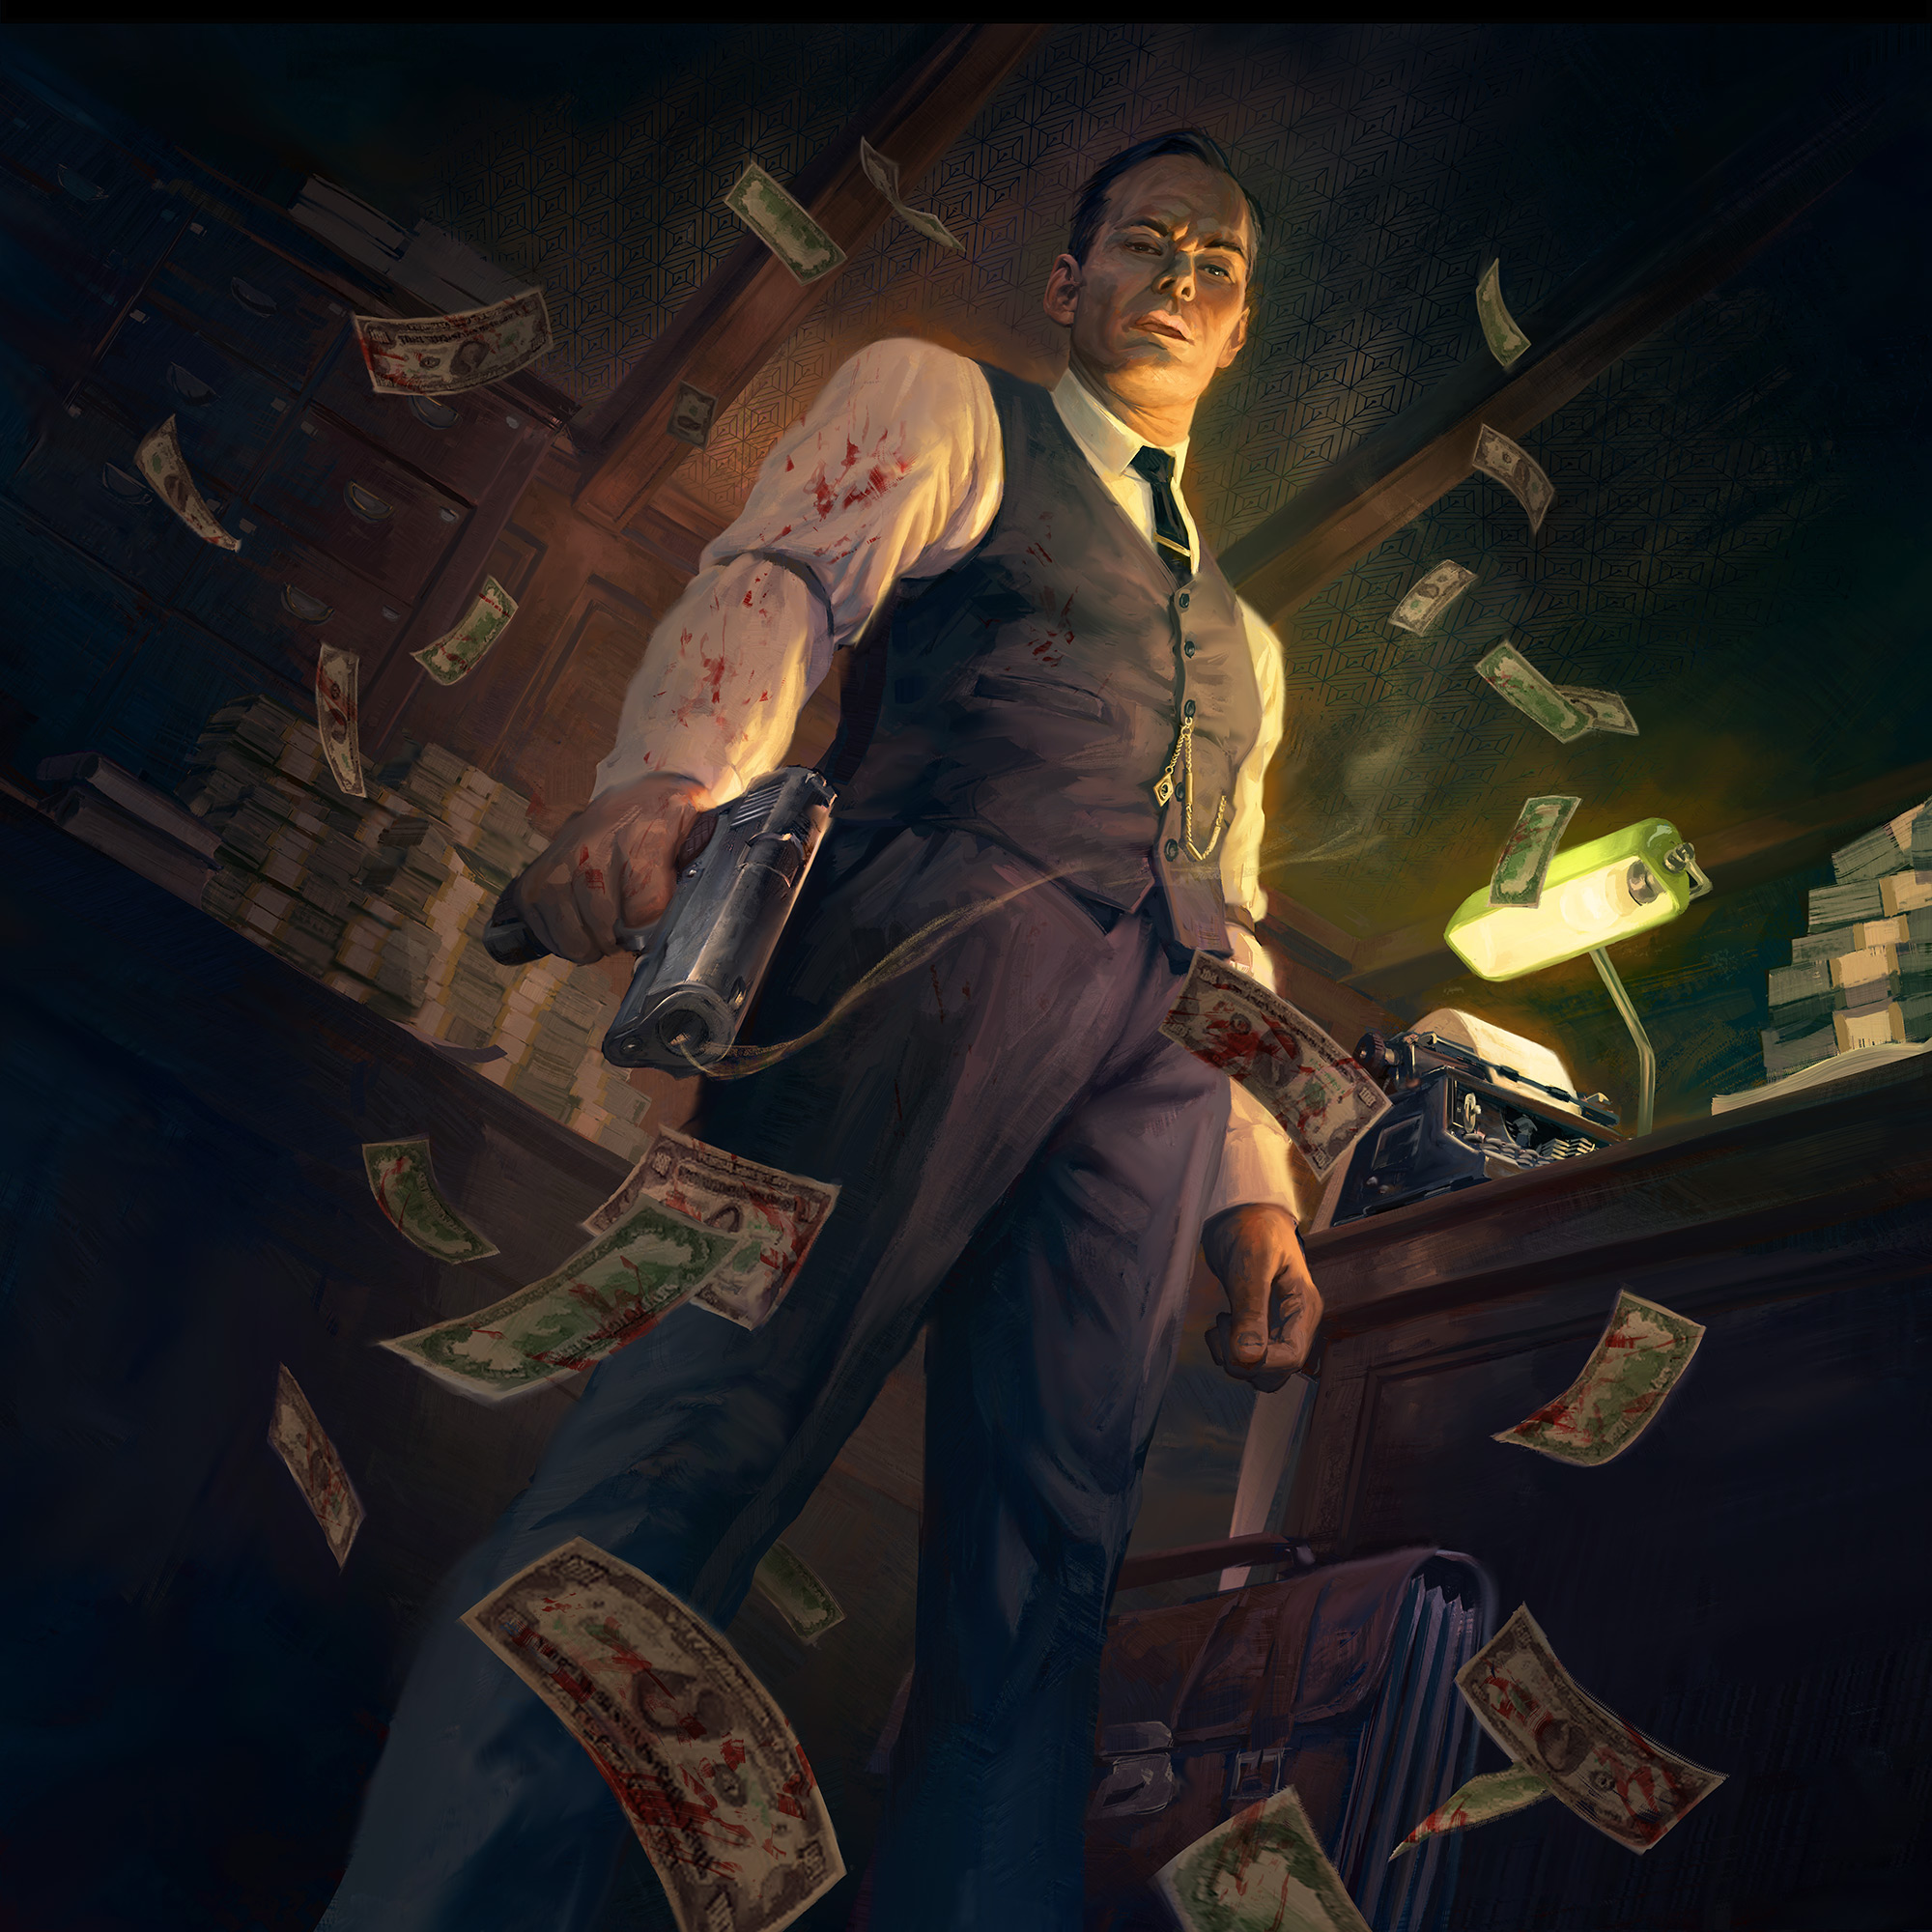 PDXCON: Анонсировано дополнение для Empire of Sin — Make it Count